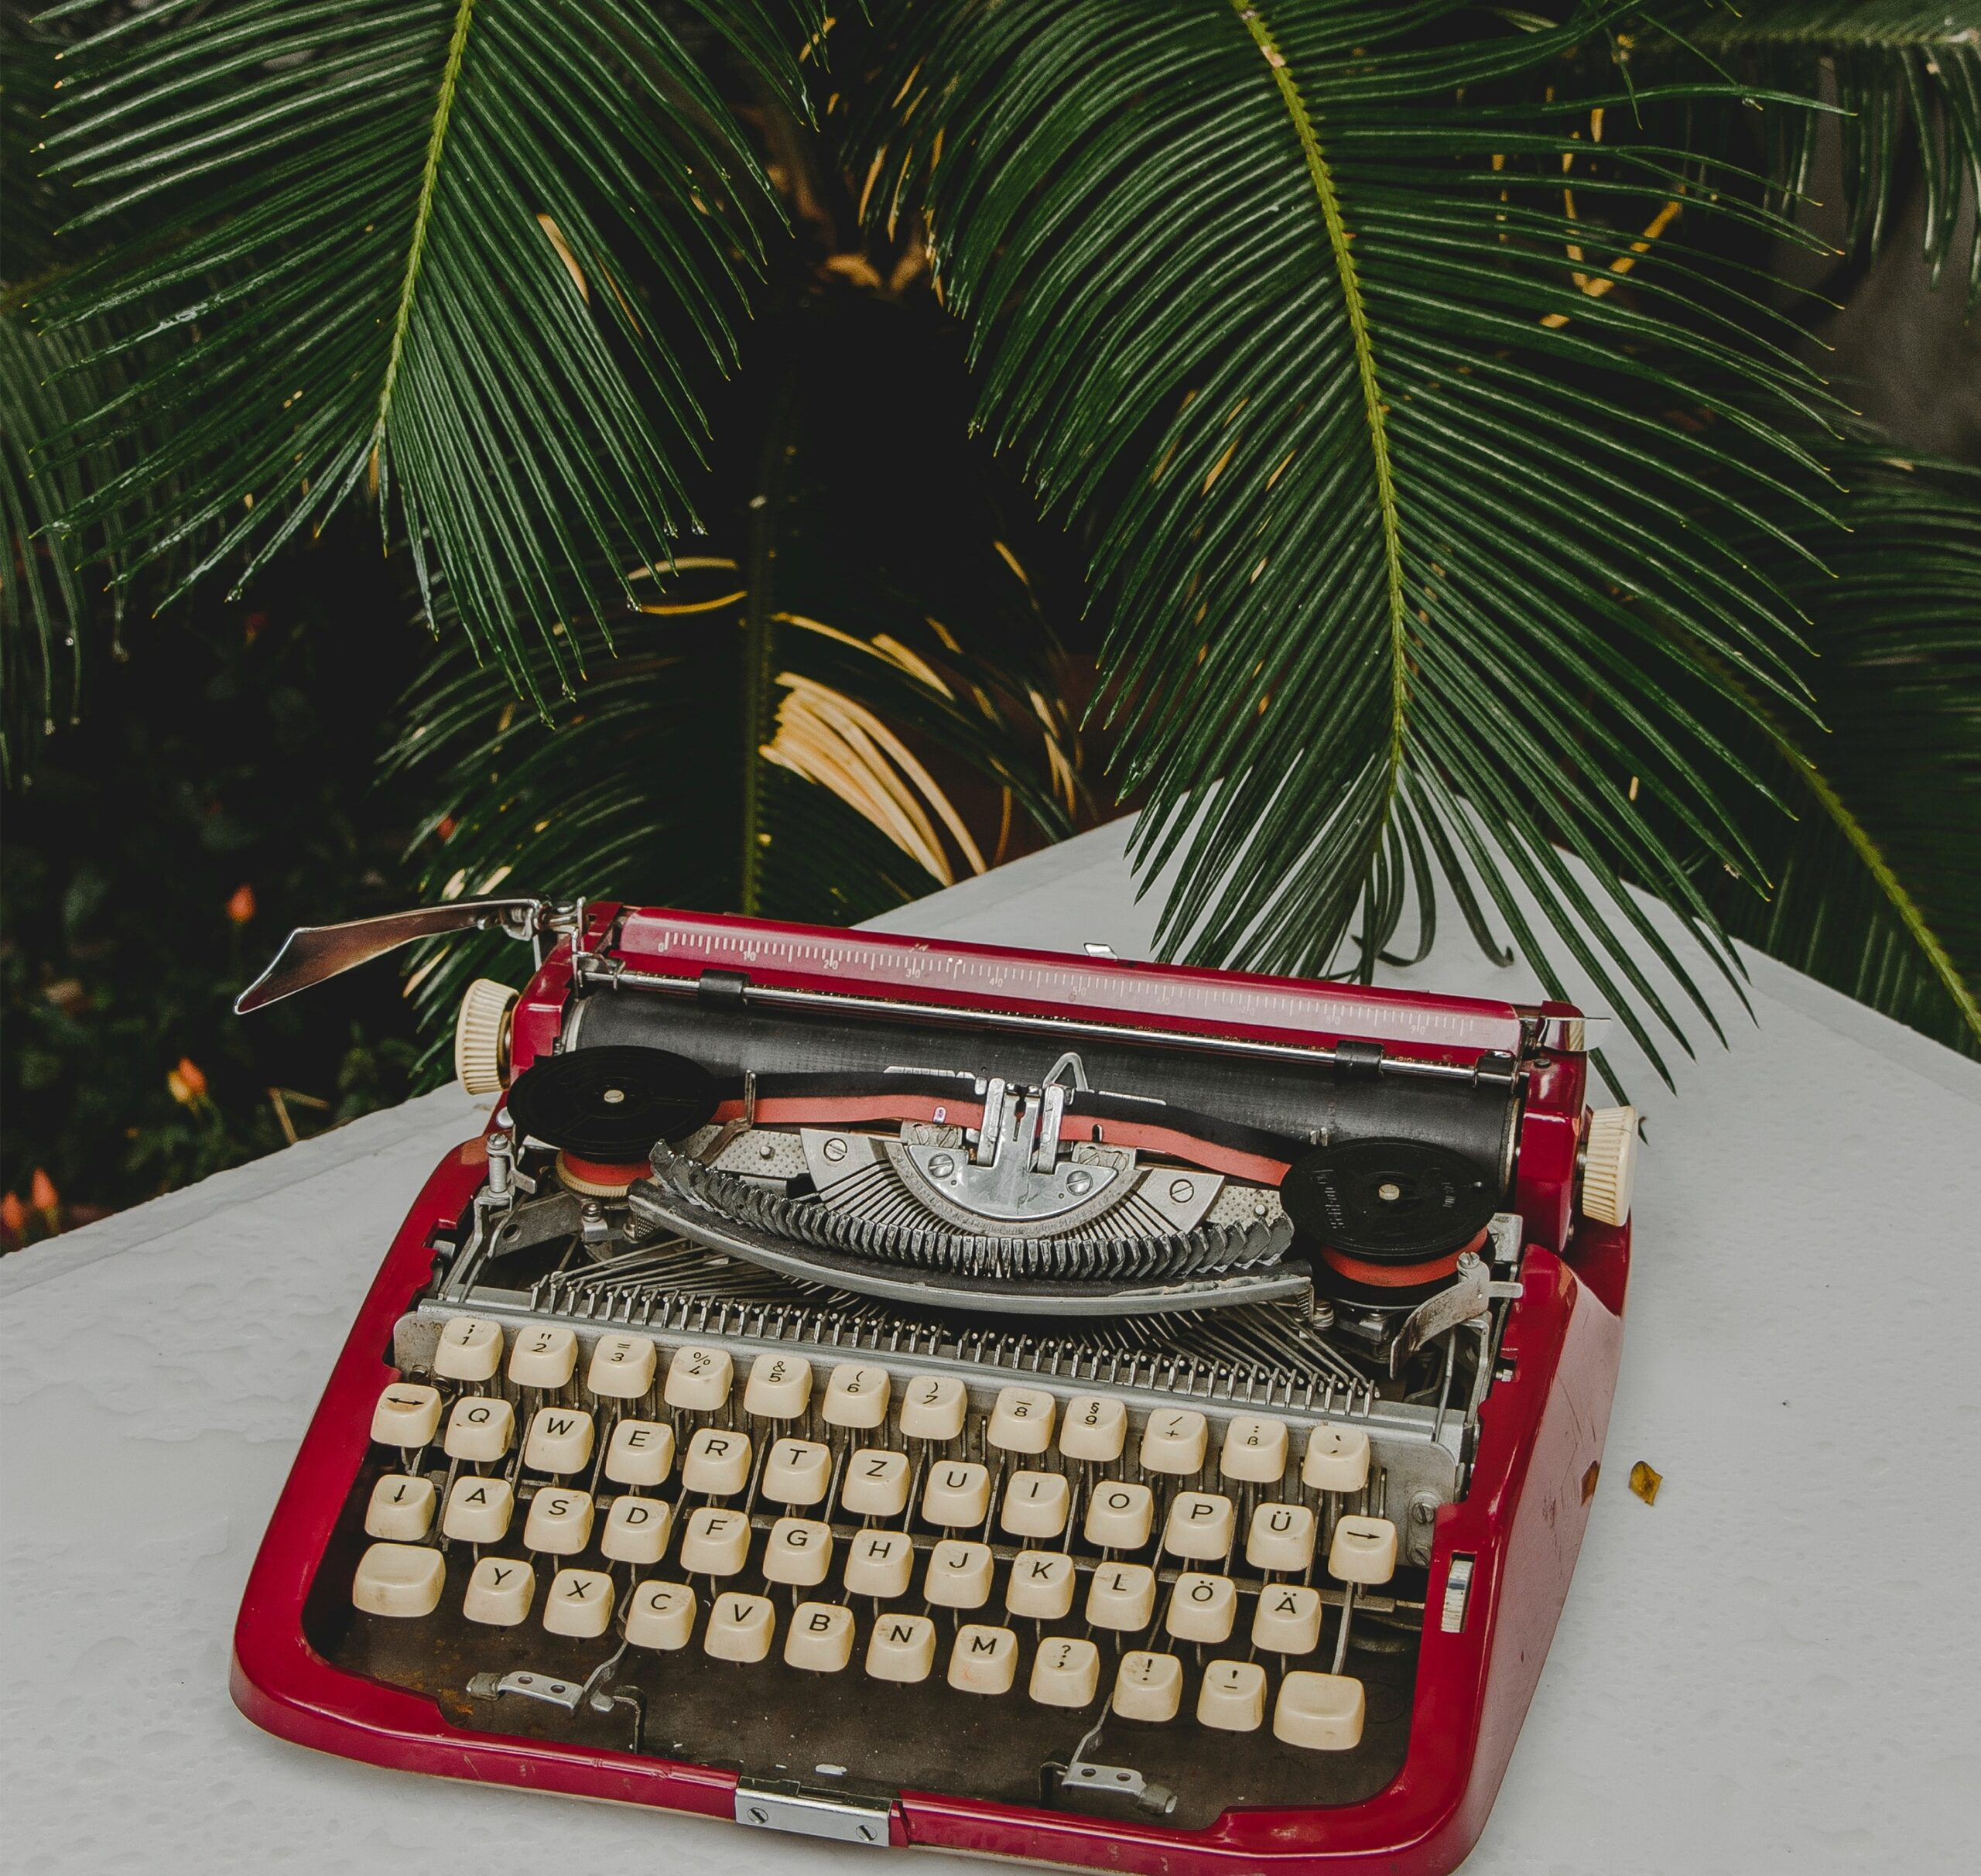 The Romantic Travel Writer